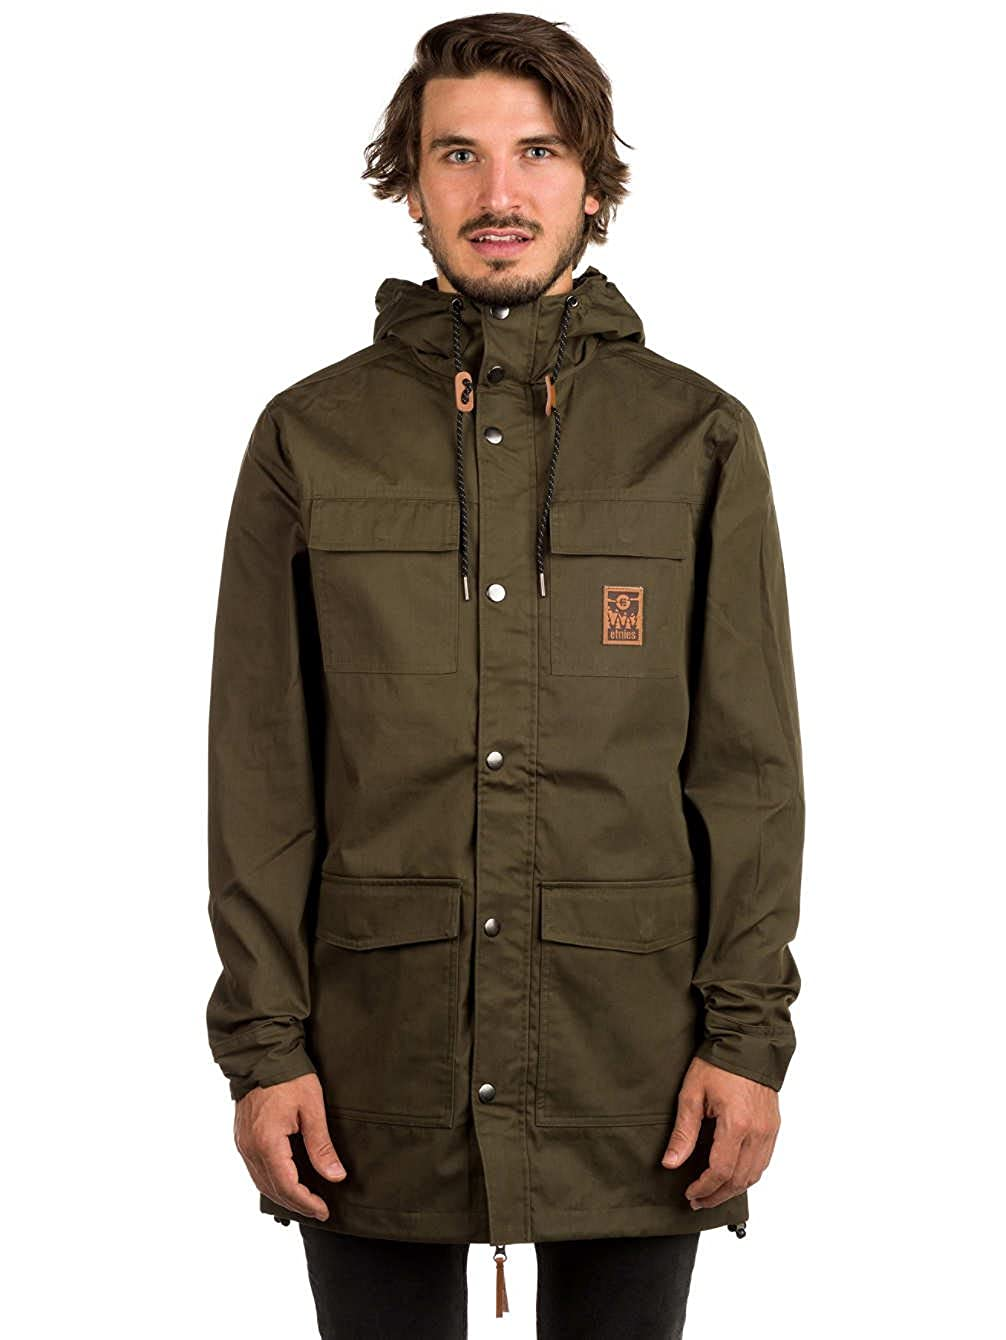 Herren ParkaBekleidung Etnies Manchester Etnies Jacke Herren 8O0knPXwNZ